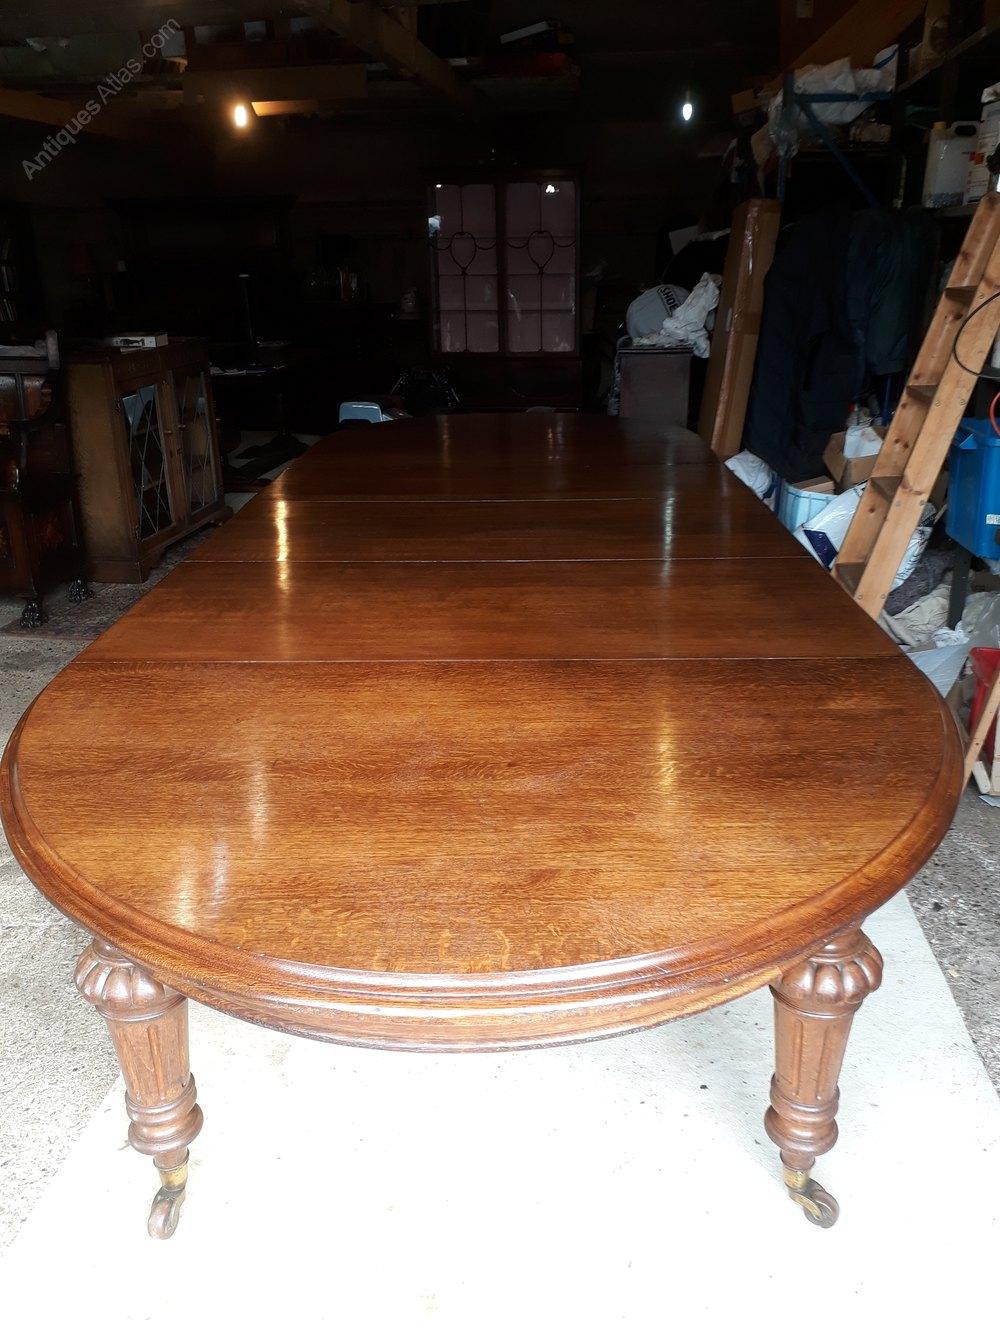 010960684899 Large Mid 19th C Oak Extending Dining Table - Antiques Atlas